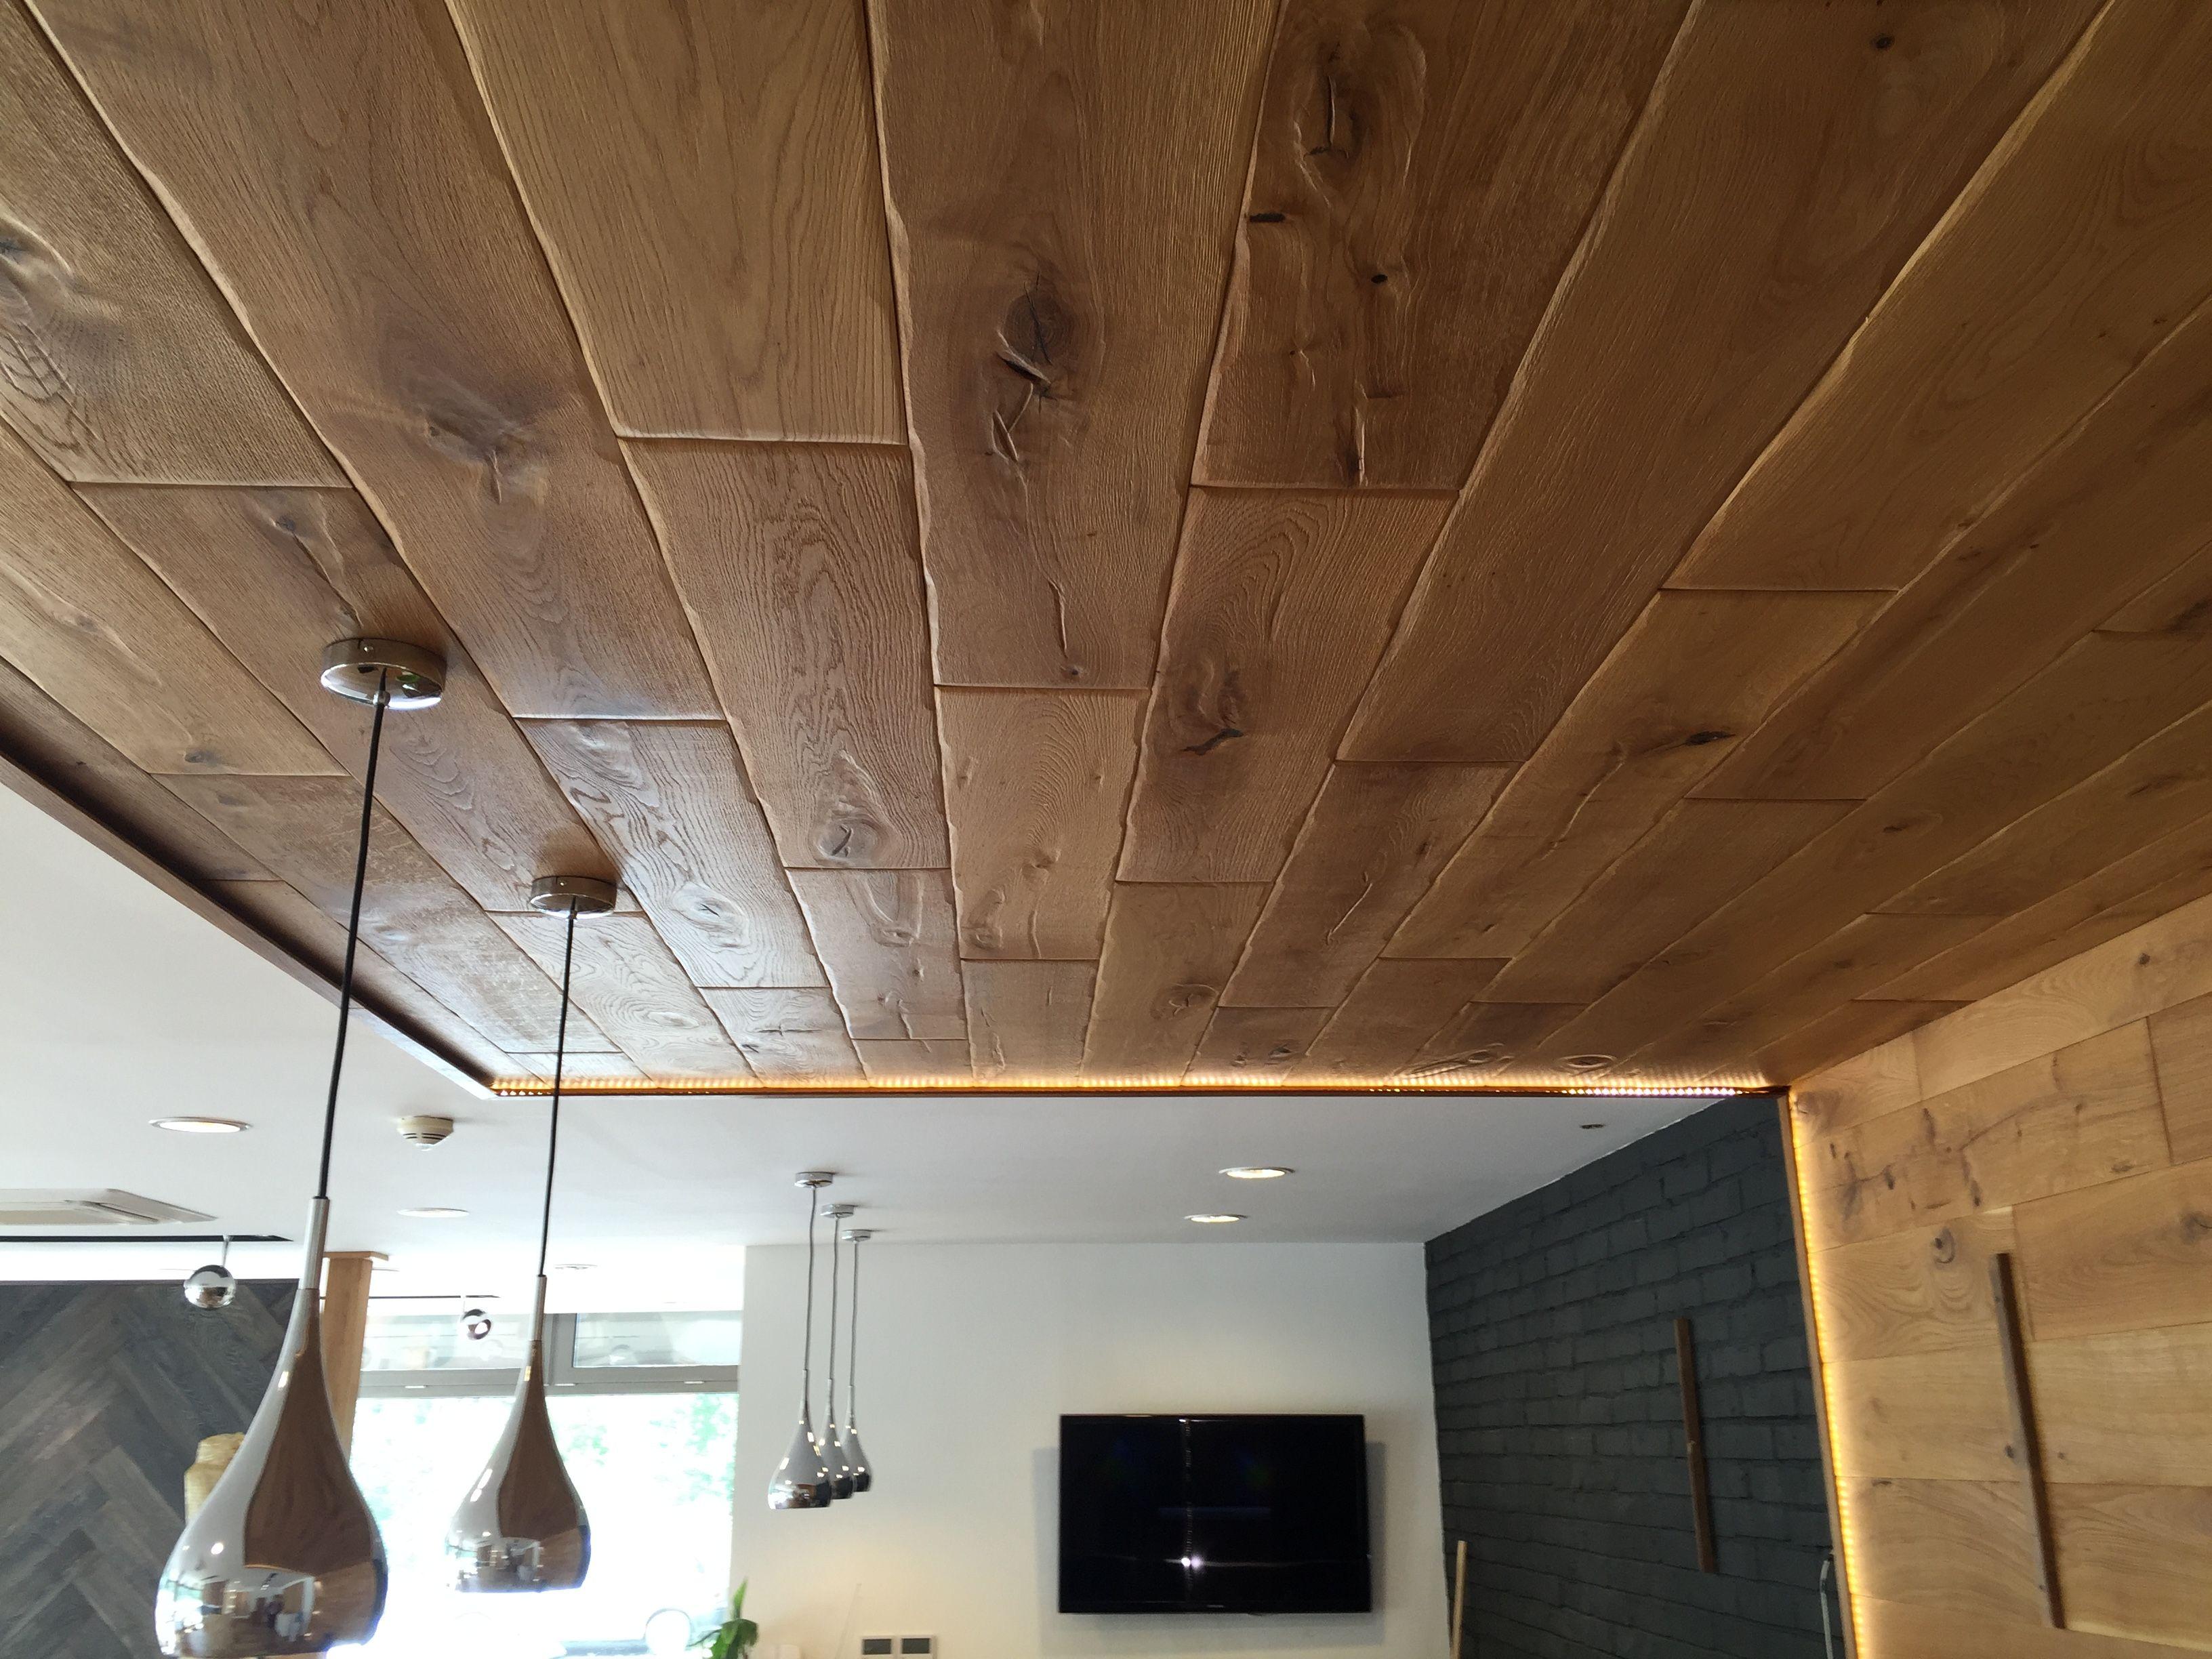 Edelholz Historica 1000 as ceiling / wall decoration